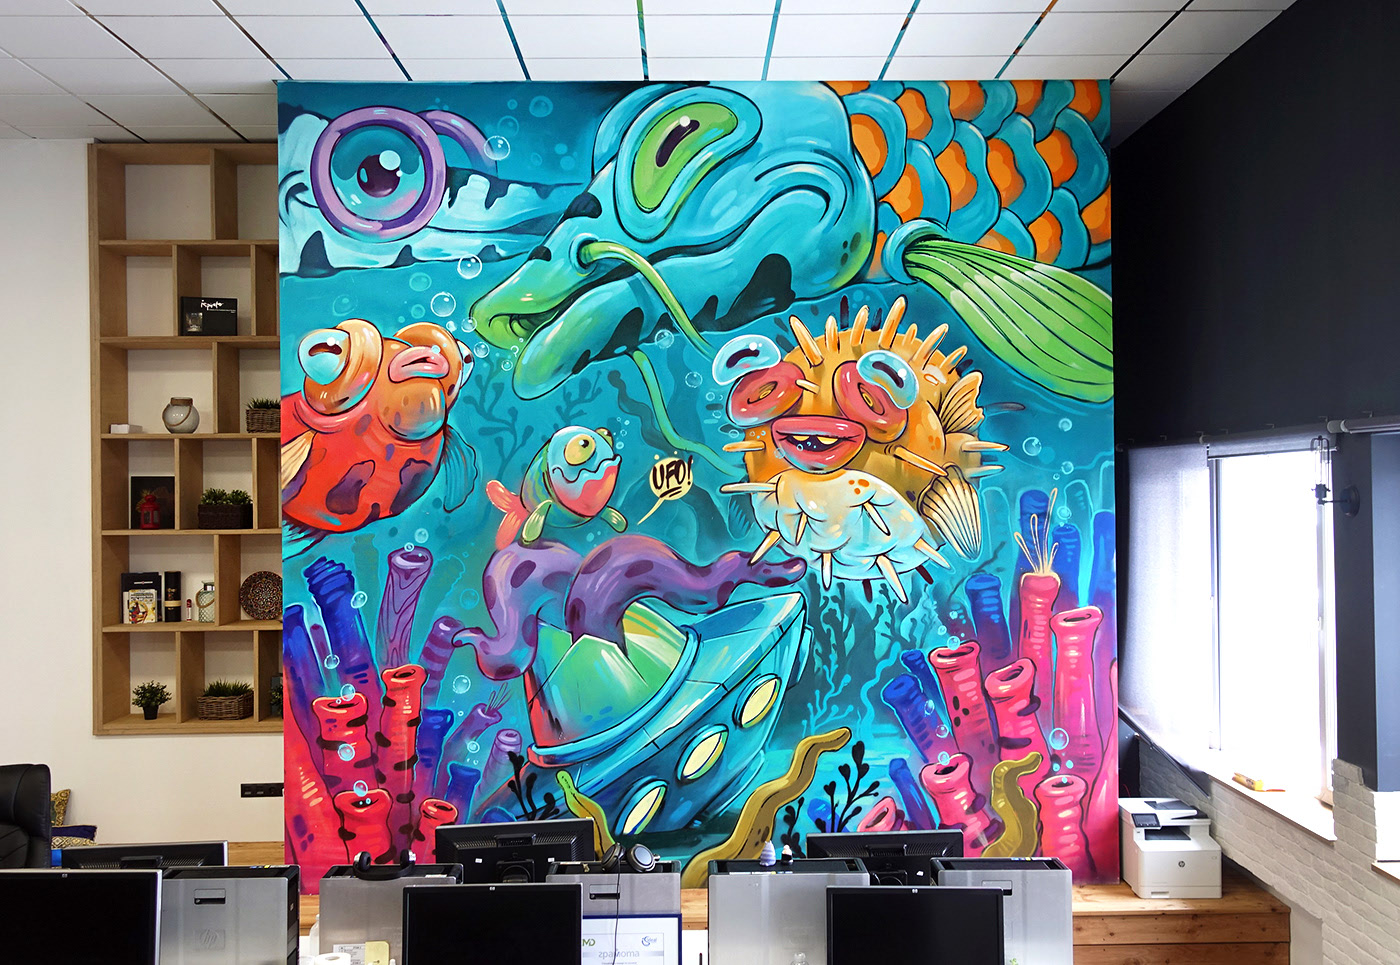 Interior Design, Graffiti, Illustration